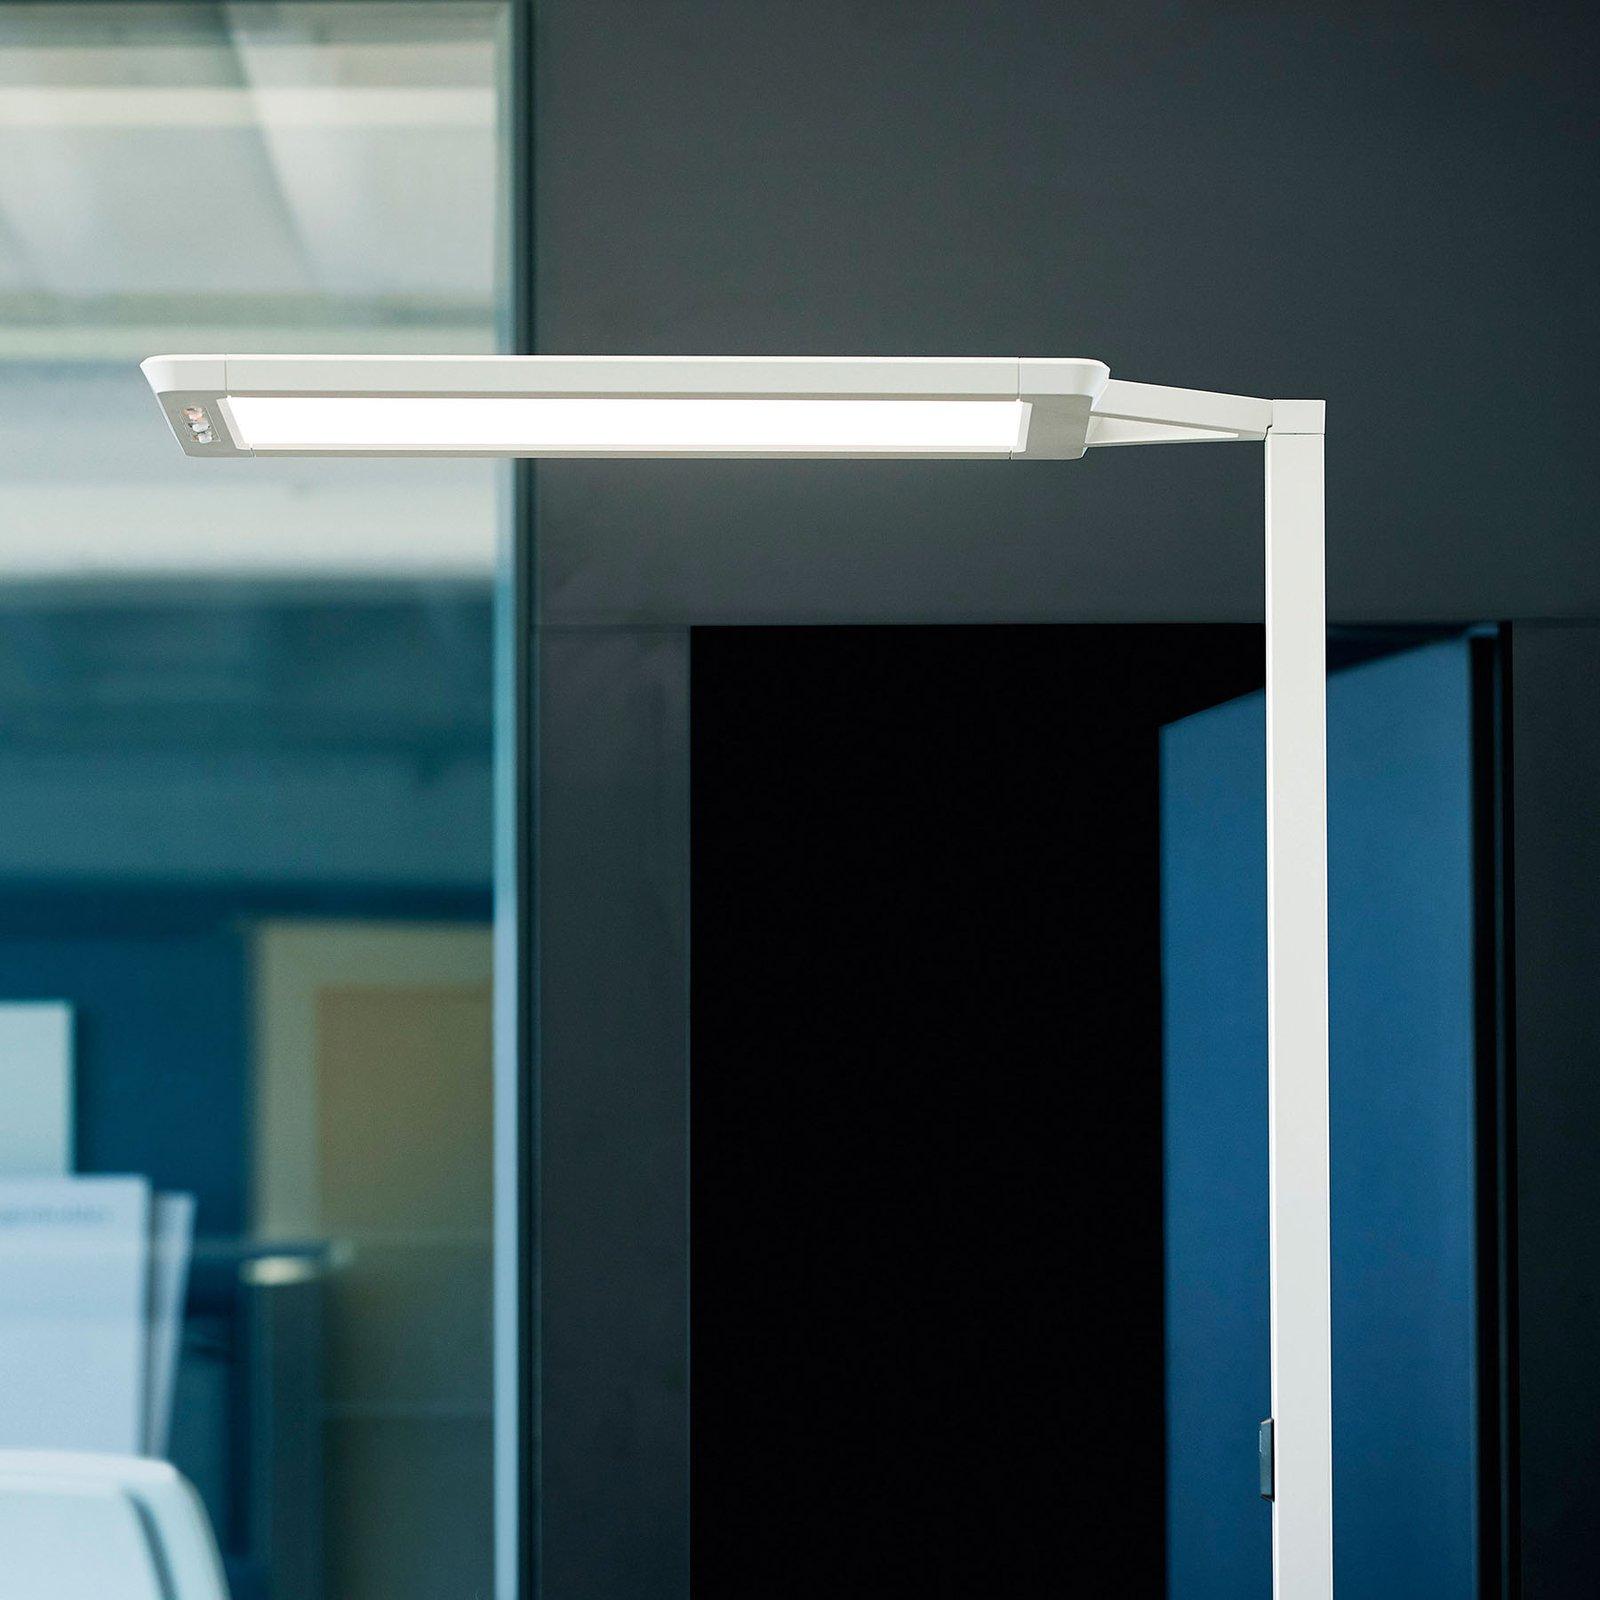 LED-gulvlampe Yara.single 4 000 K, BT, LTX, sølv